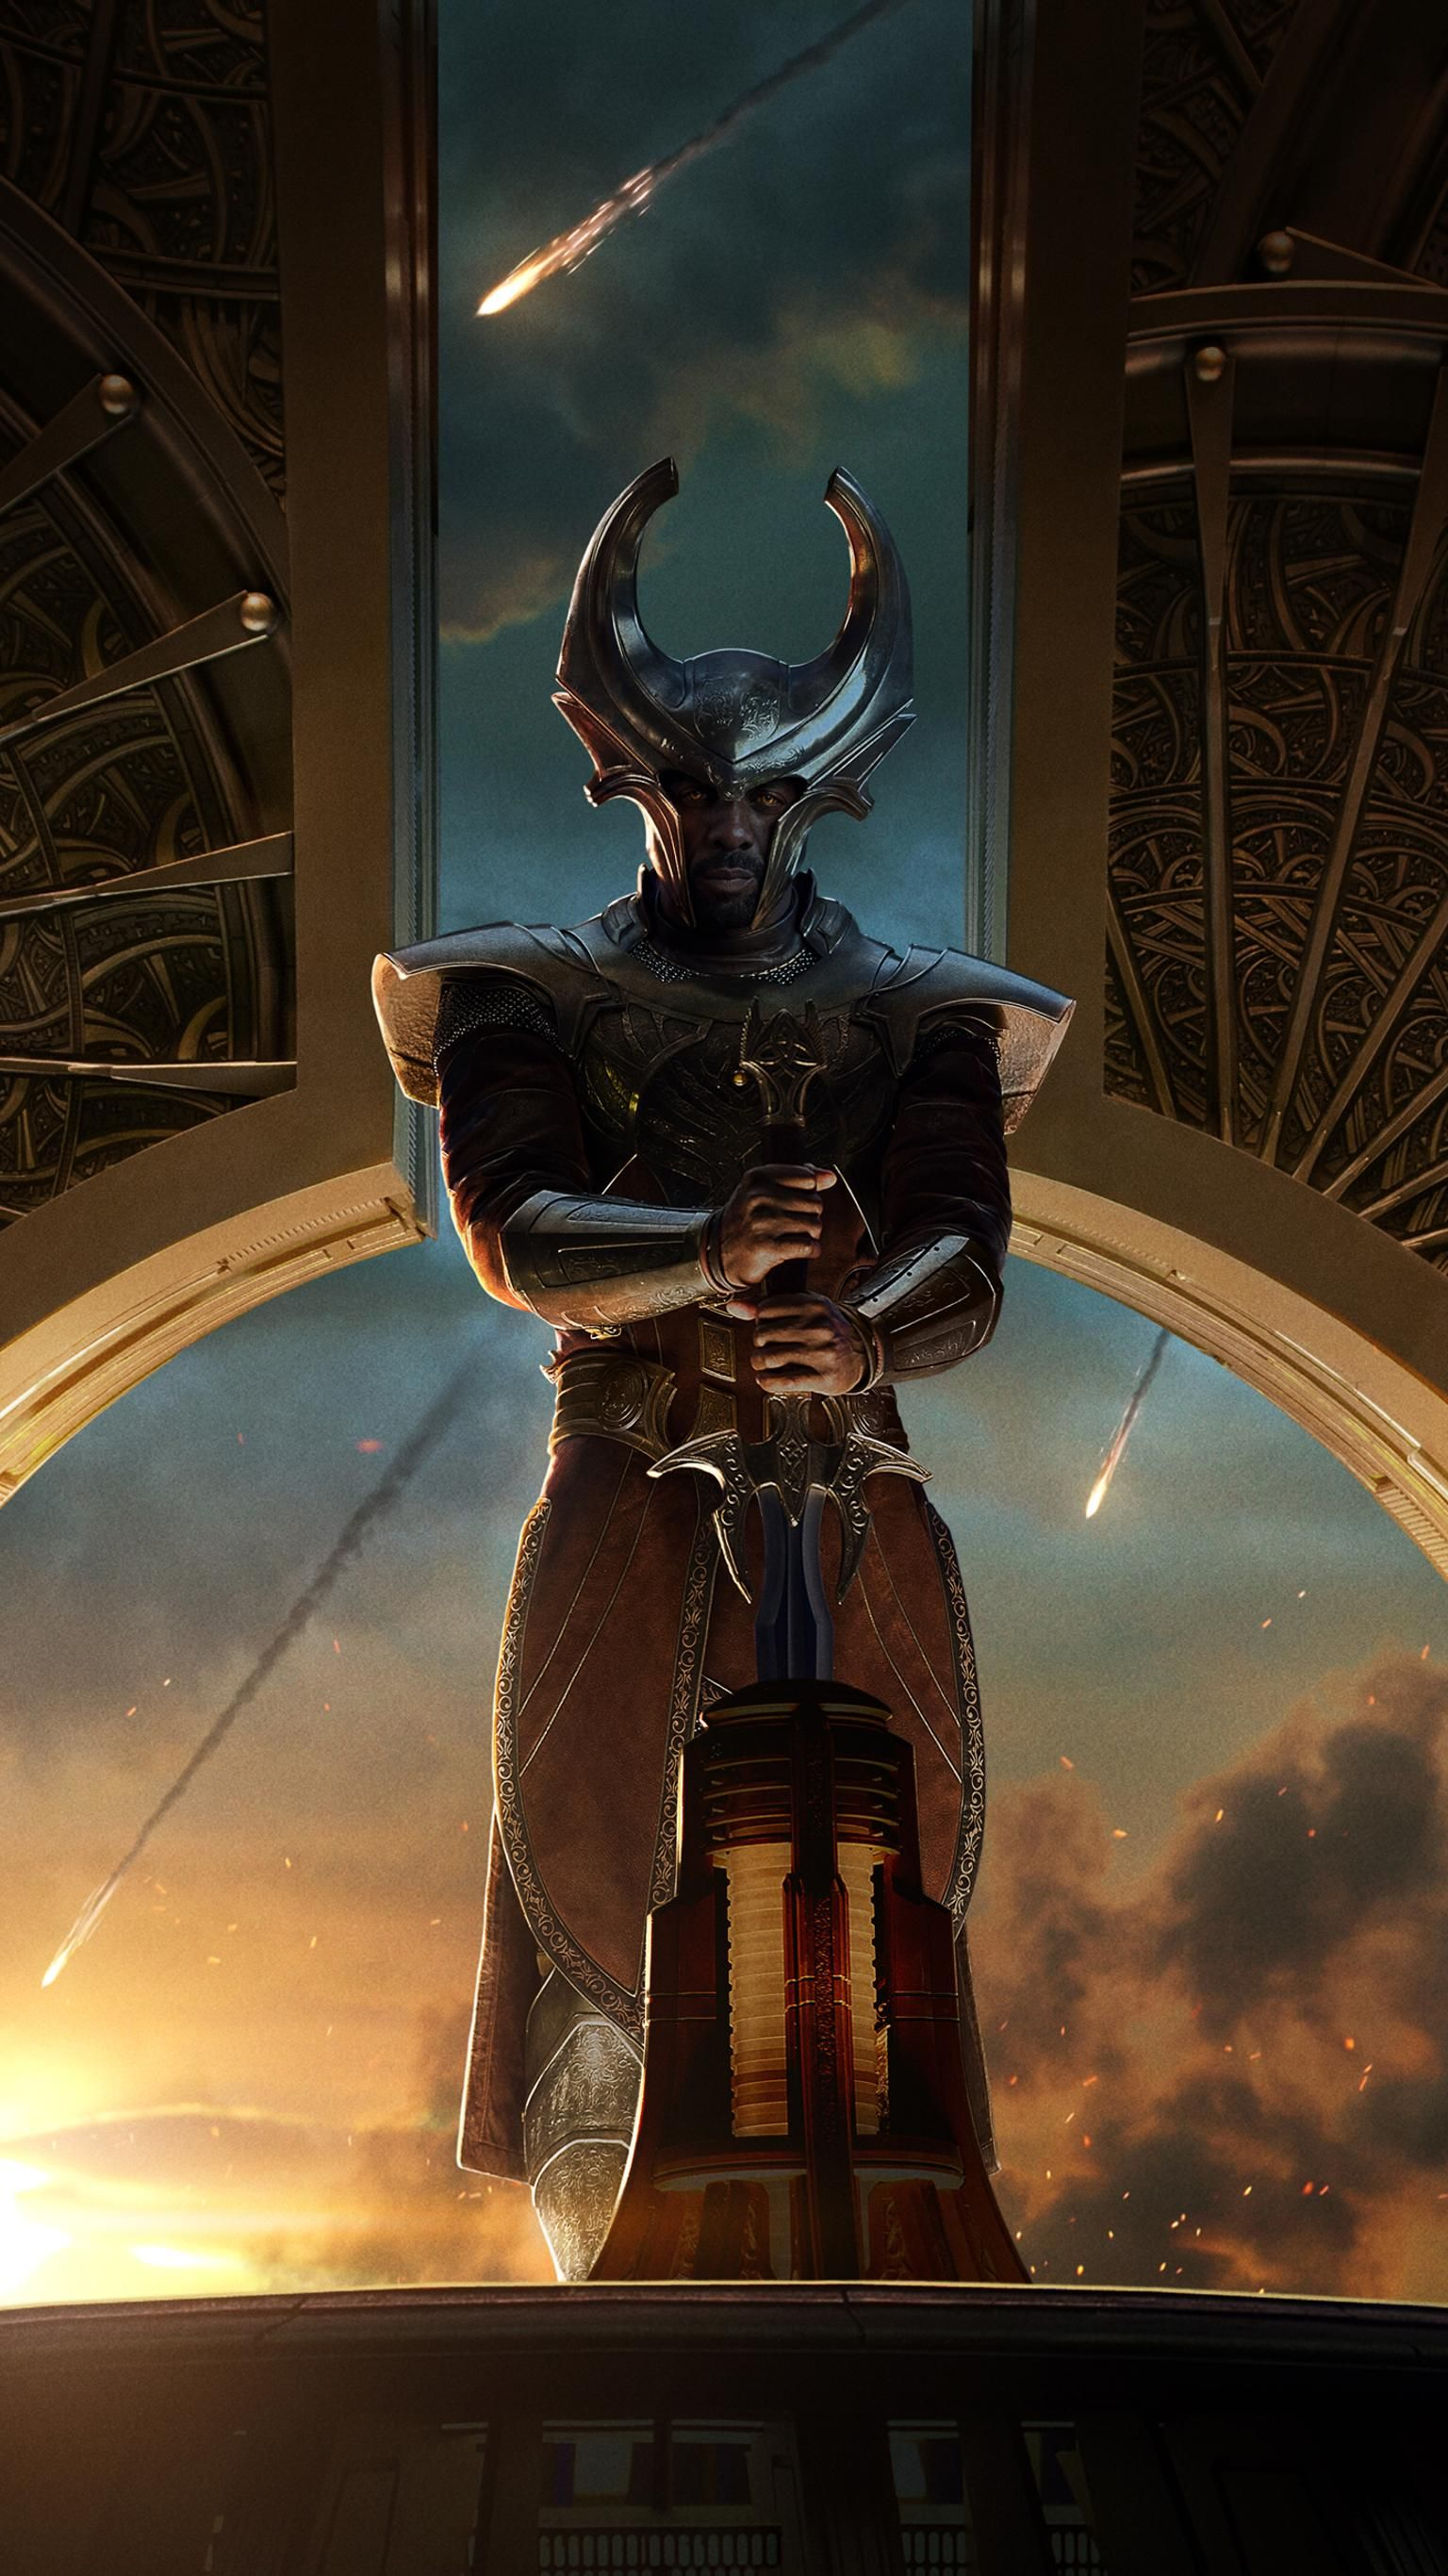 Thor The Dark World (2013) Phone Wallpaper Marvel